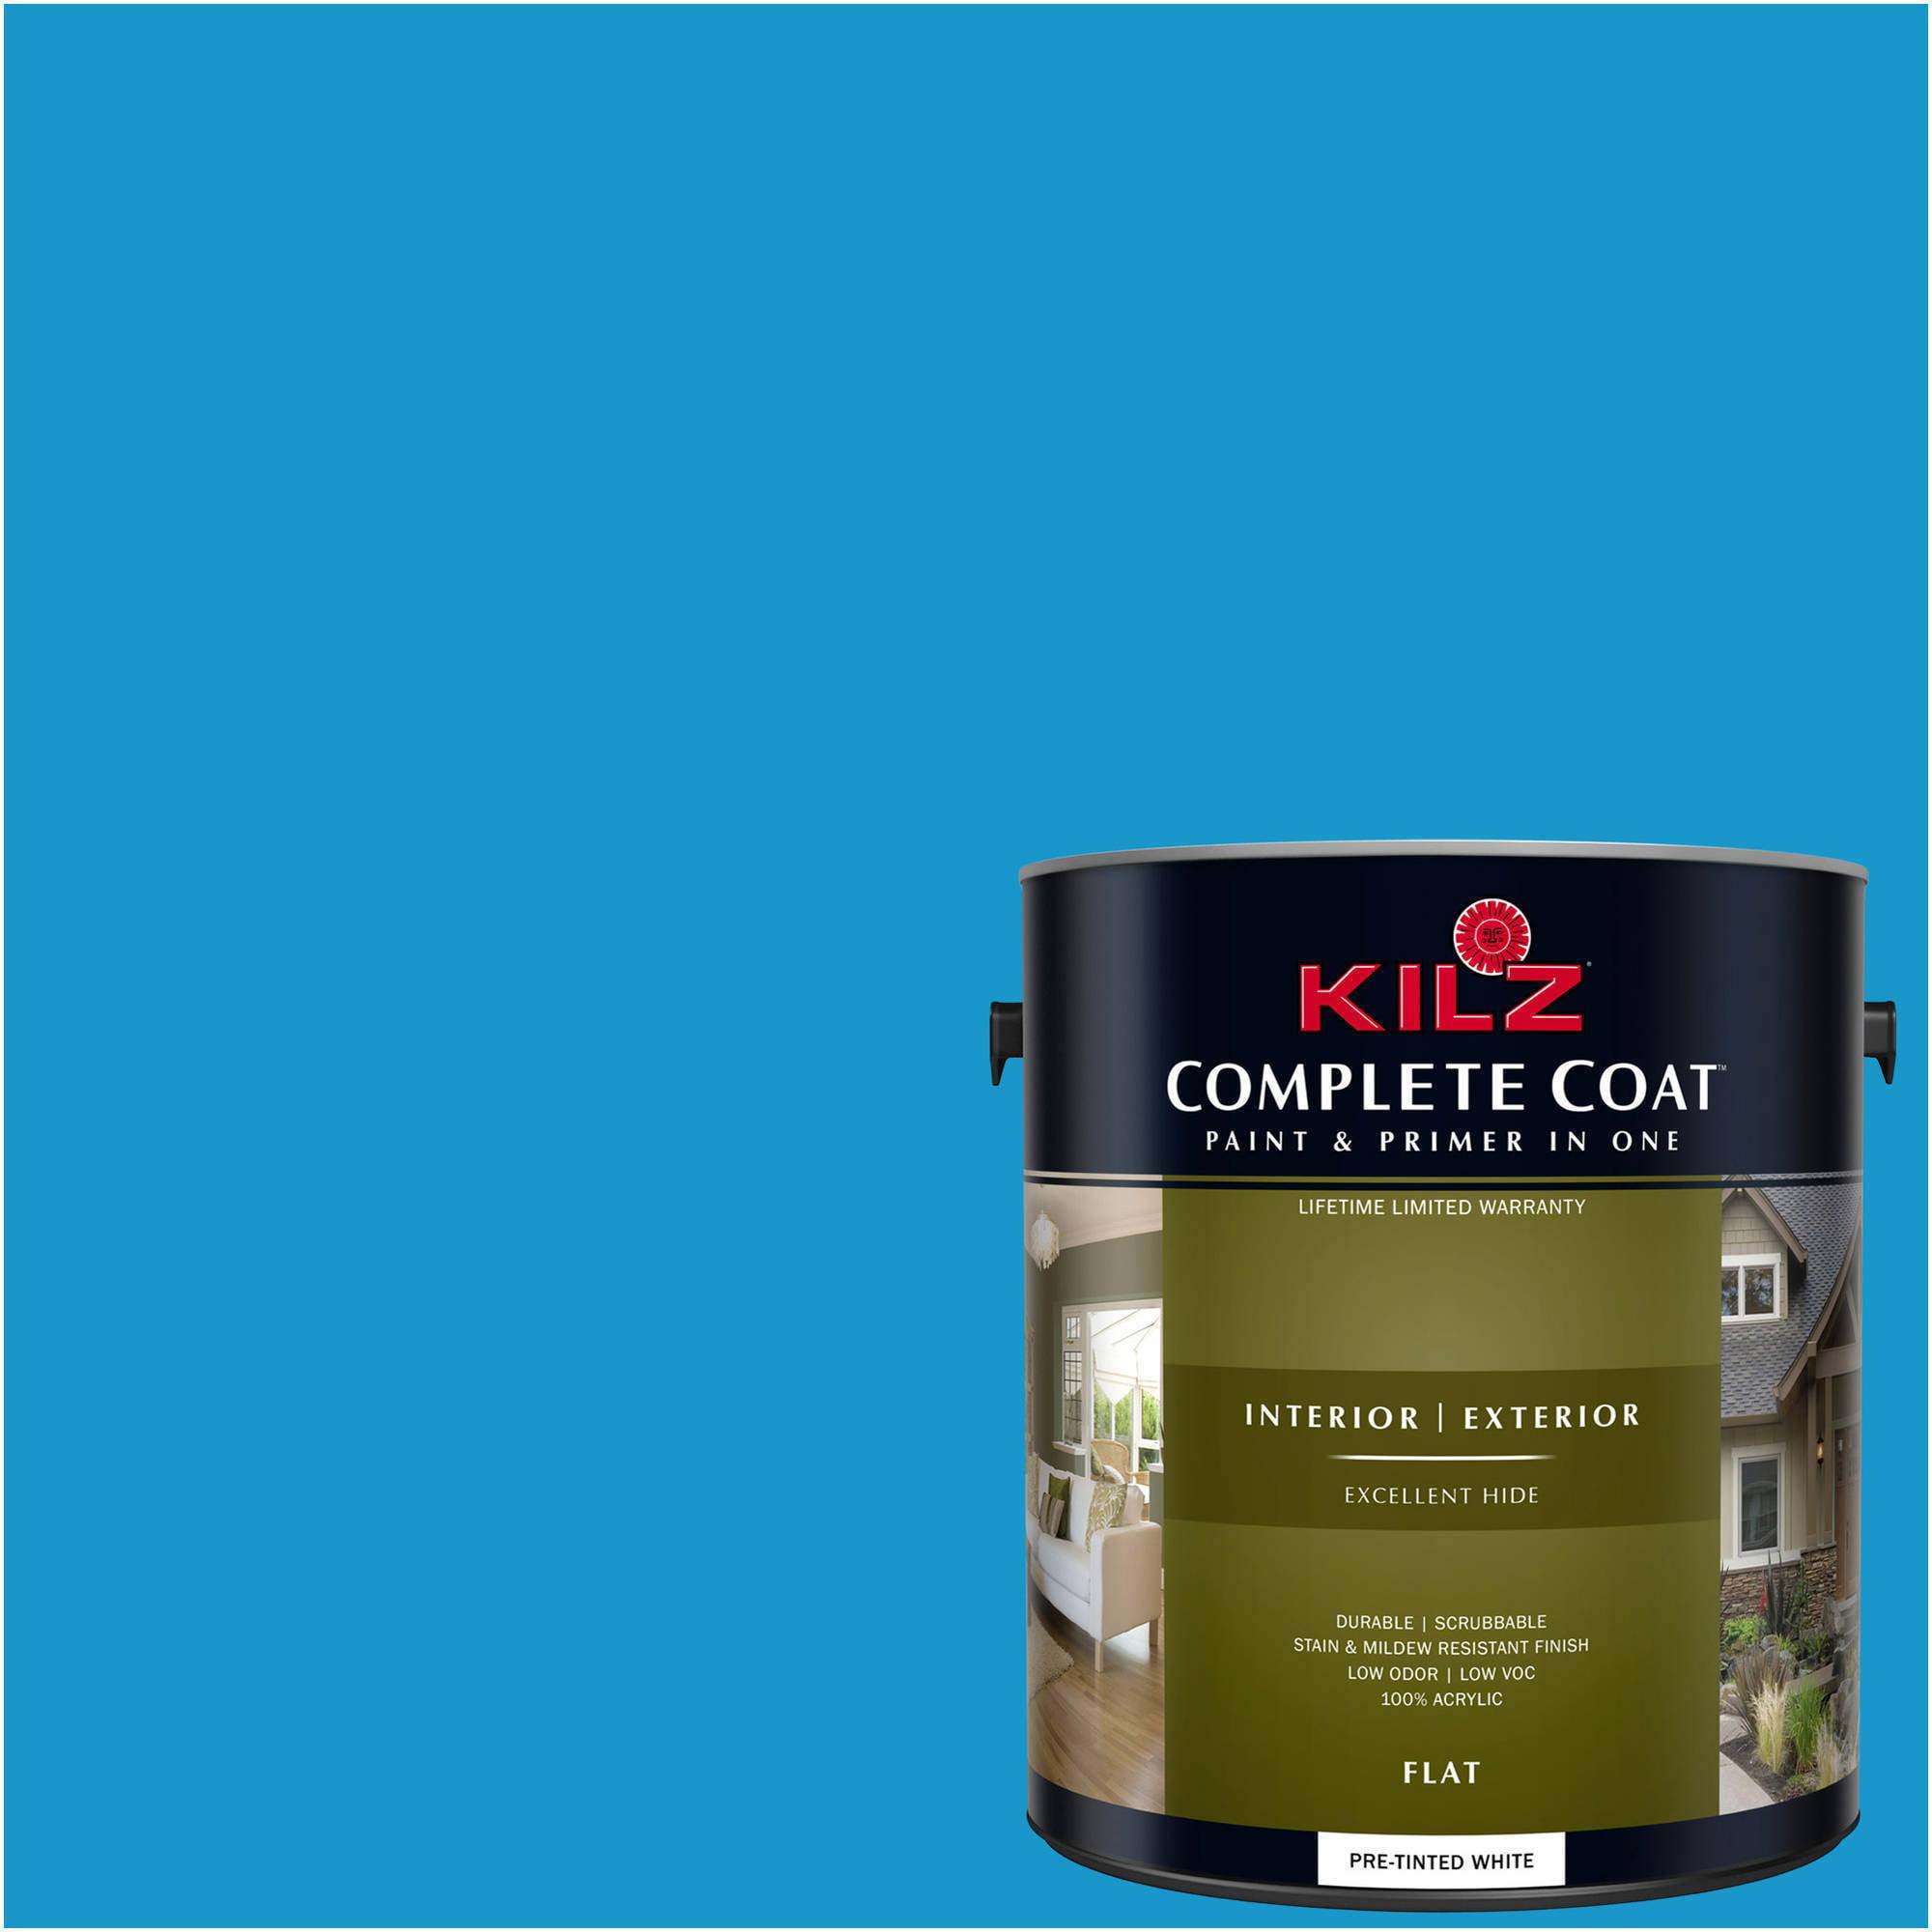 KILZ COMPLETE COAT Interior/Exterior Paint & Primer in One #RD280-02 Hero Blue